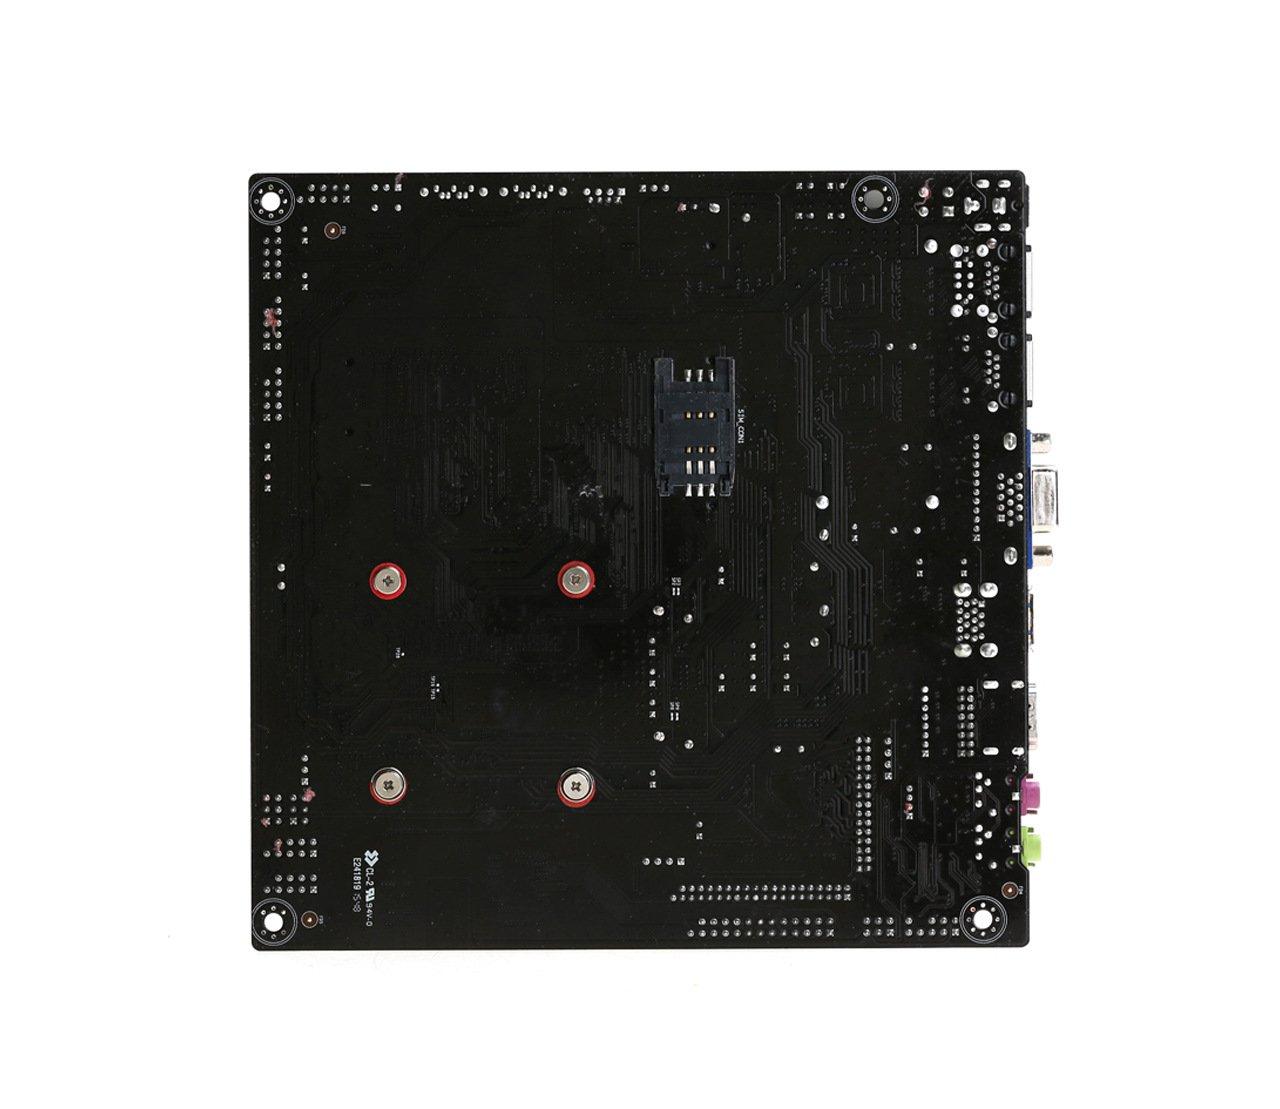 Low power mini 17*17 core I7 motherboard